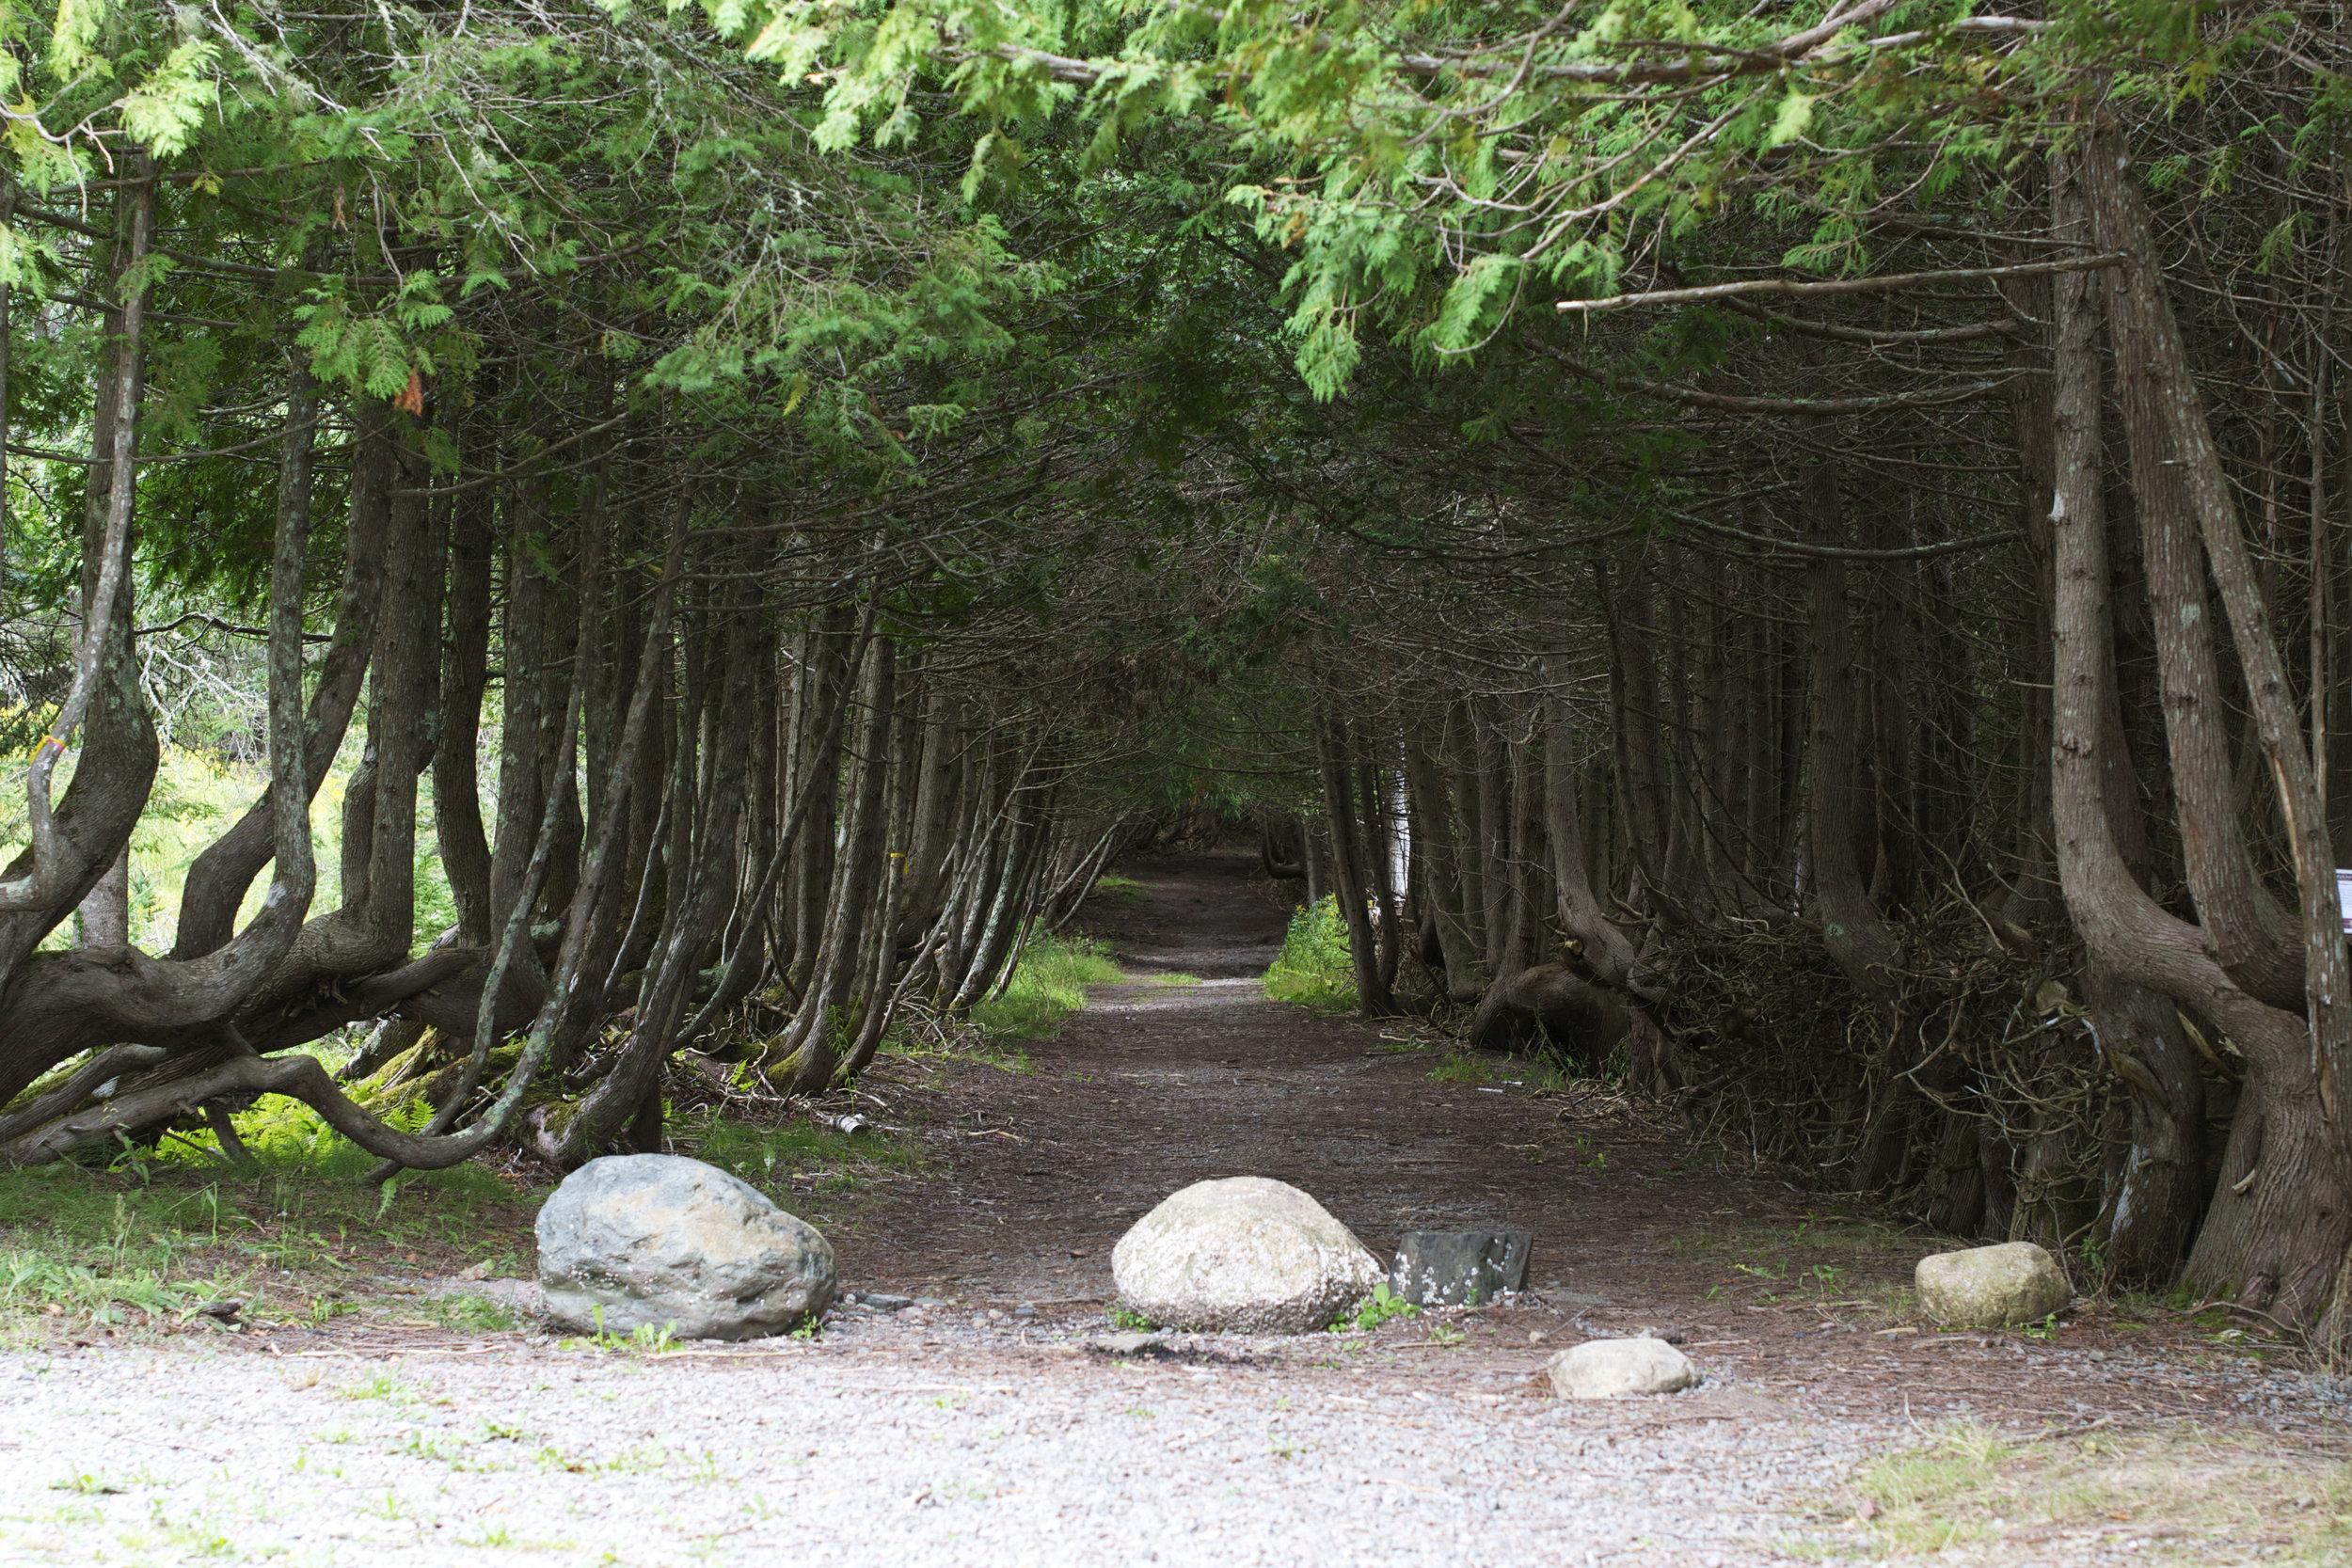 deer-run-through-trees.jpg